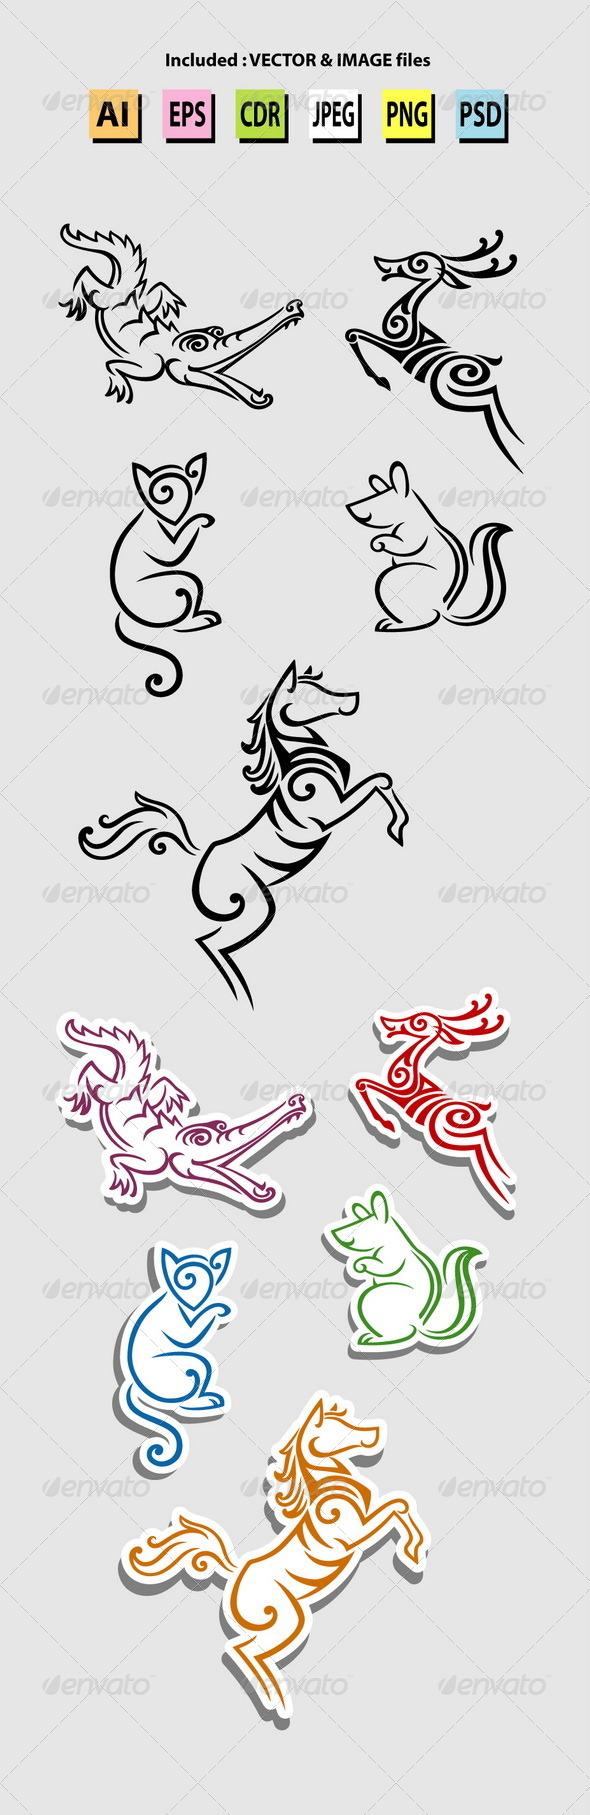 Animal Symbols - Animals Characters